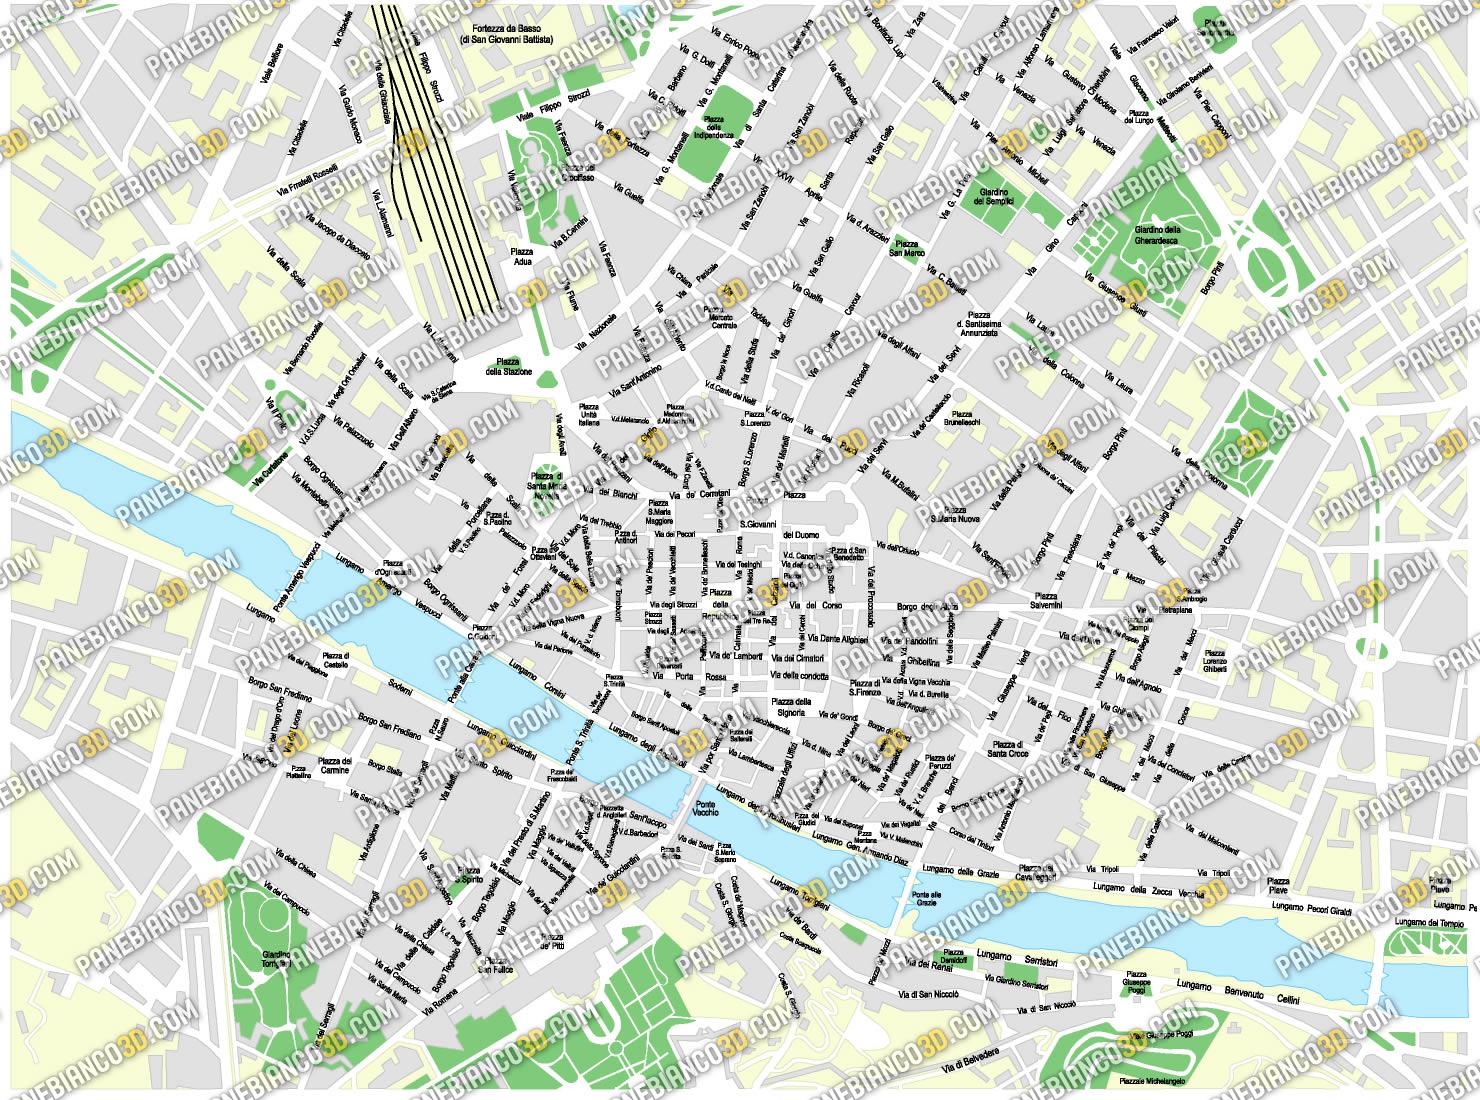 Cartina Citta Di Firenze.Mappa Di Firenze In Formato Vettoriale Ad Alta Risoluzione